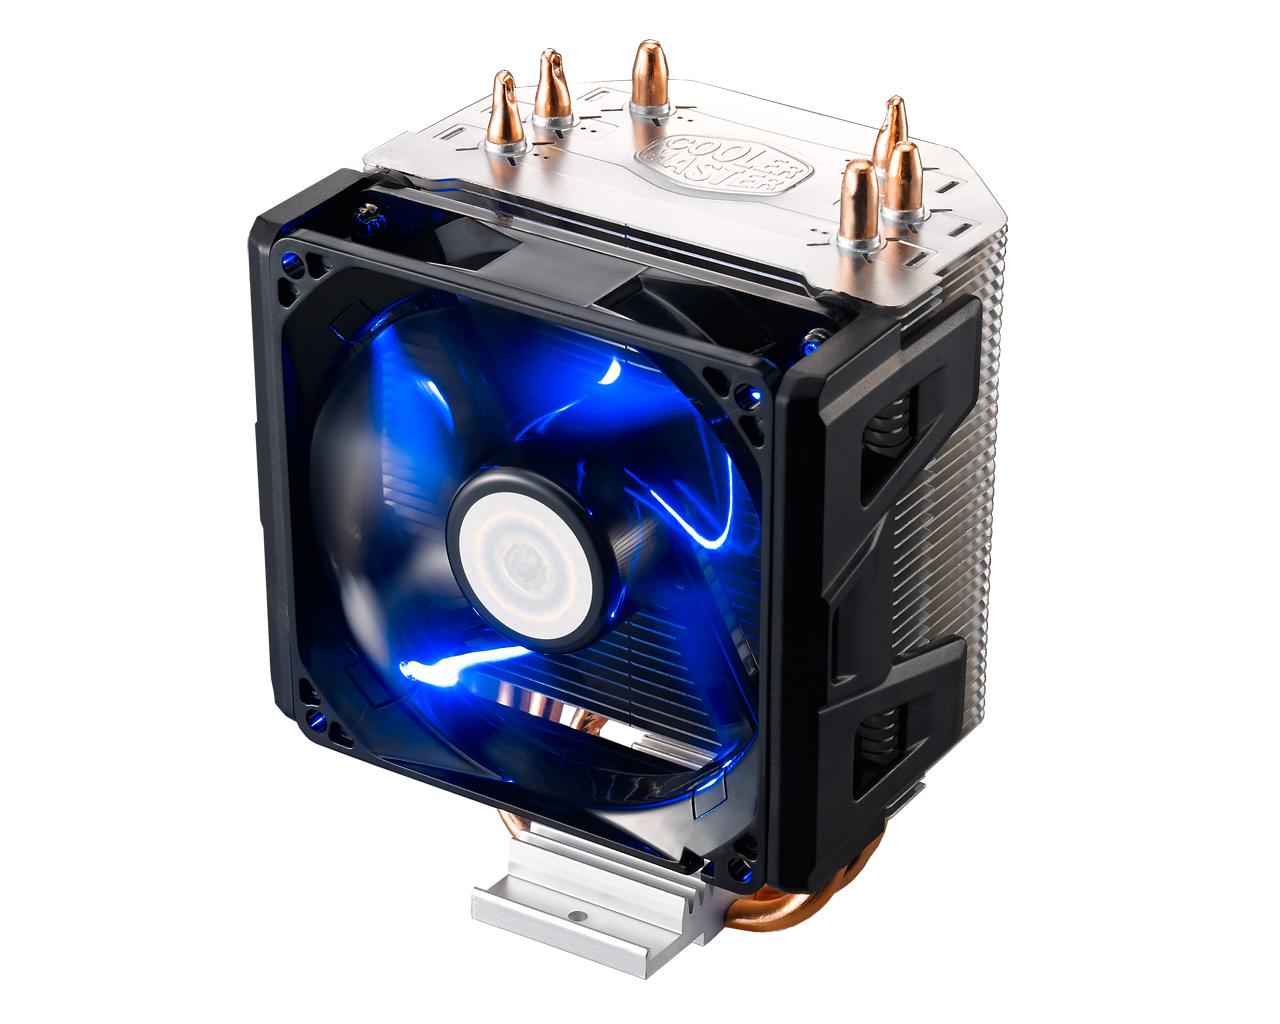 Cooler Master Hyper 103 Processor 9.2 cm Aluminum